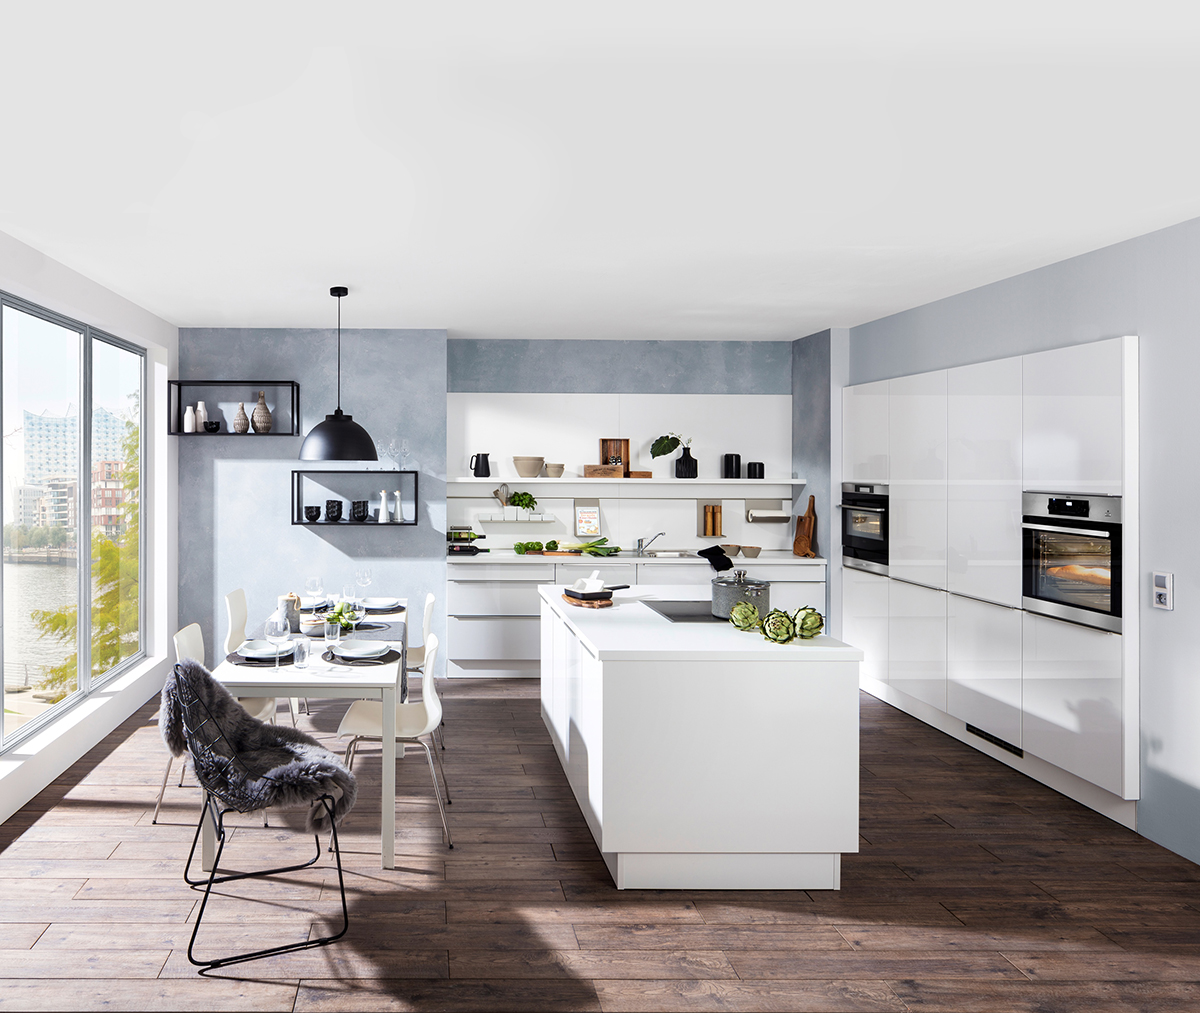 bijela-kuhinja-lesnina-xxxl-domnakvadrat